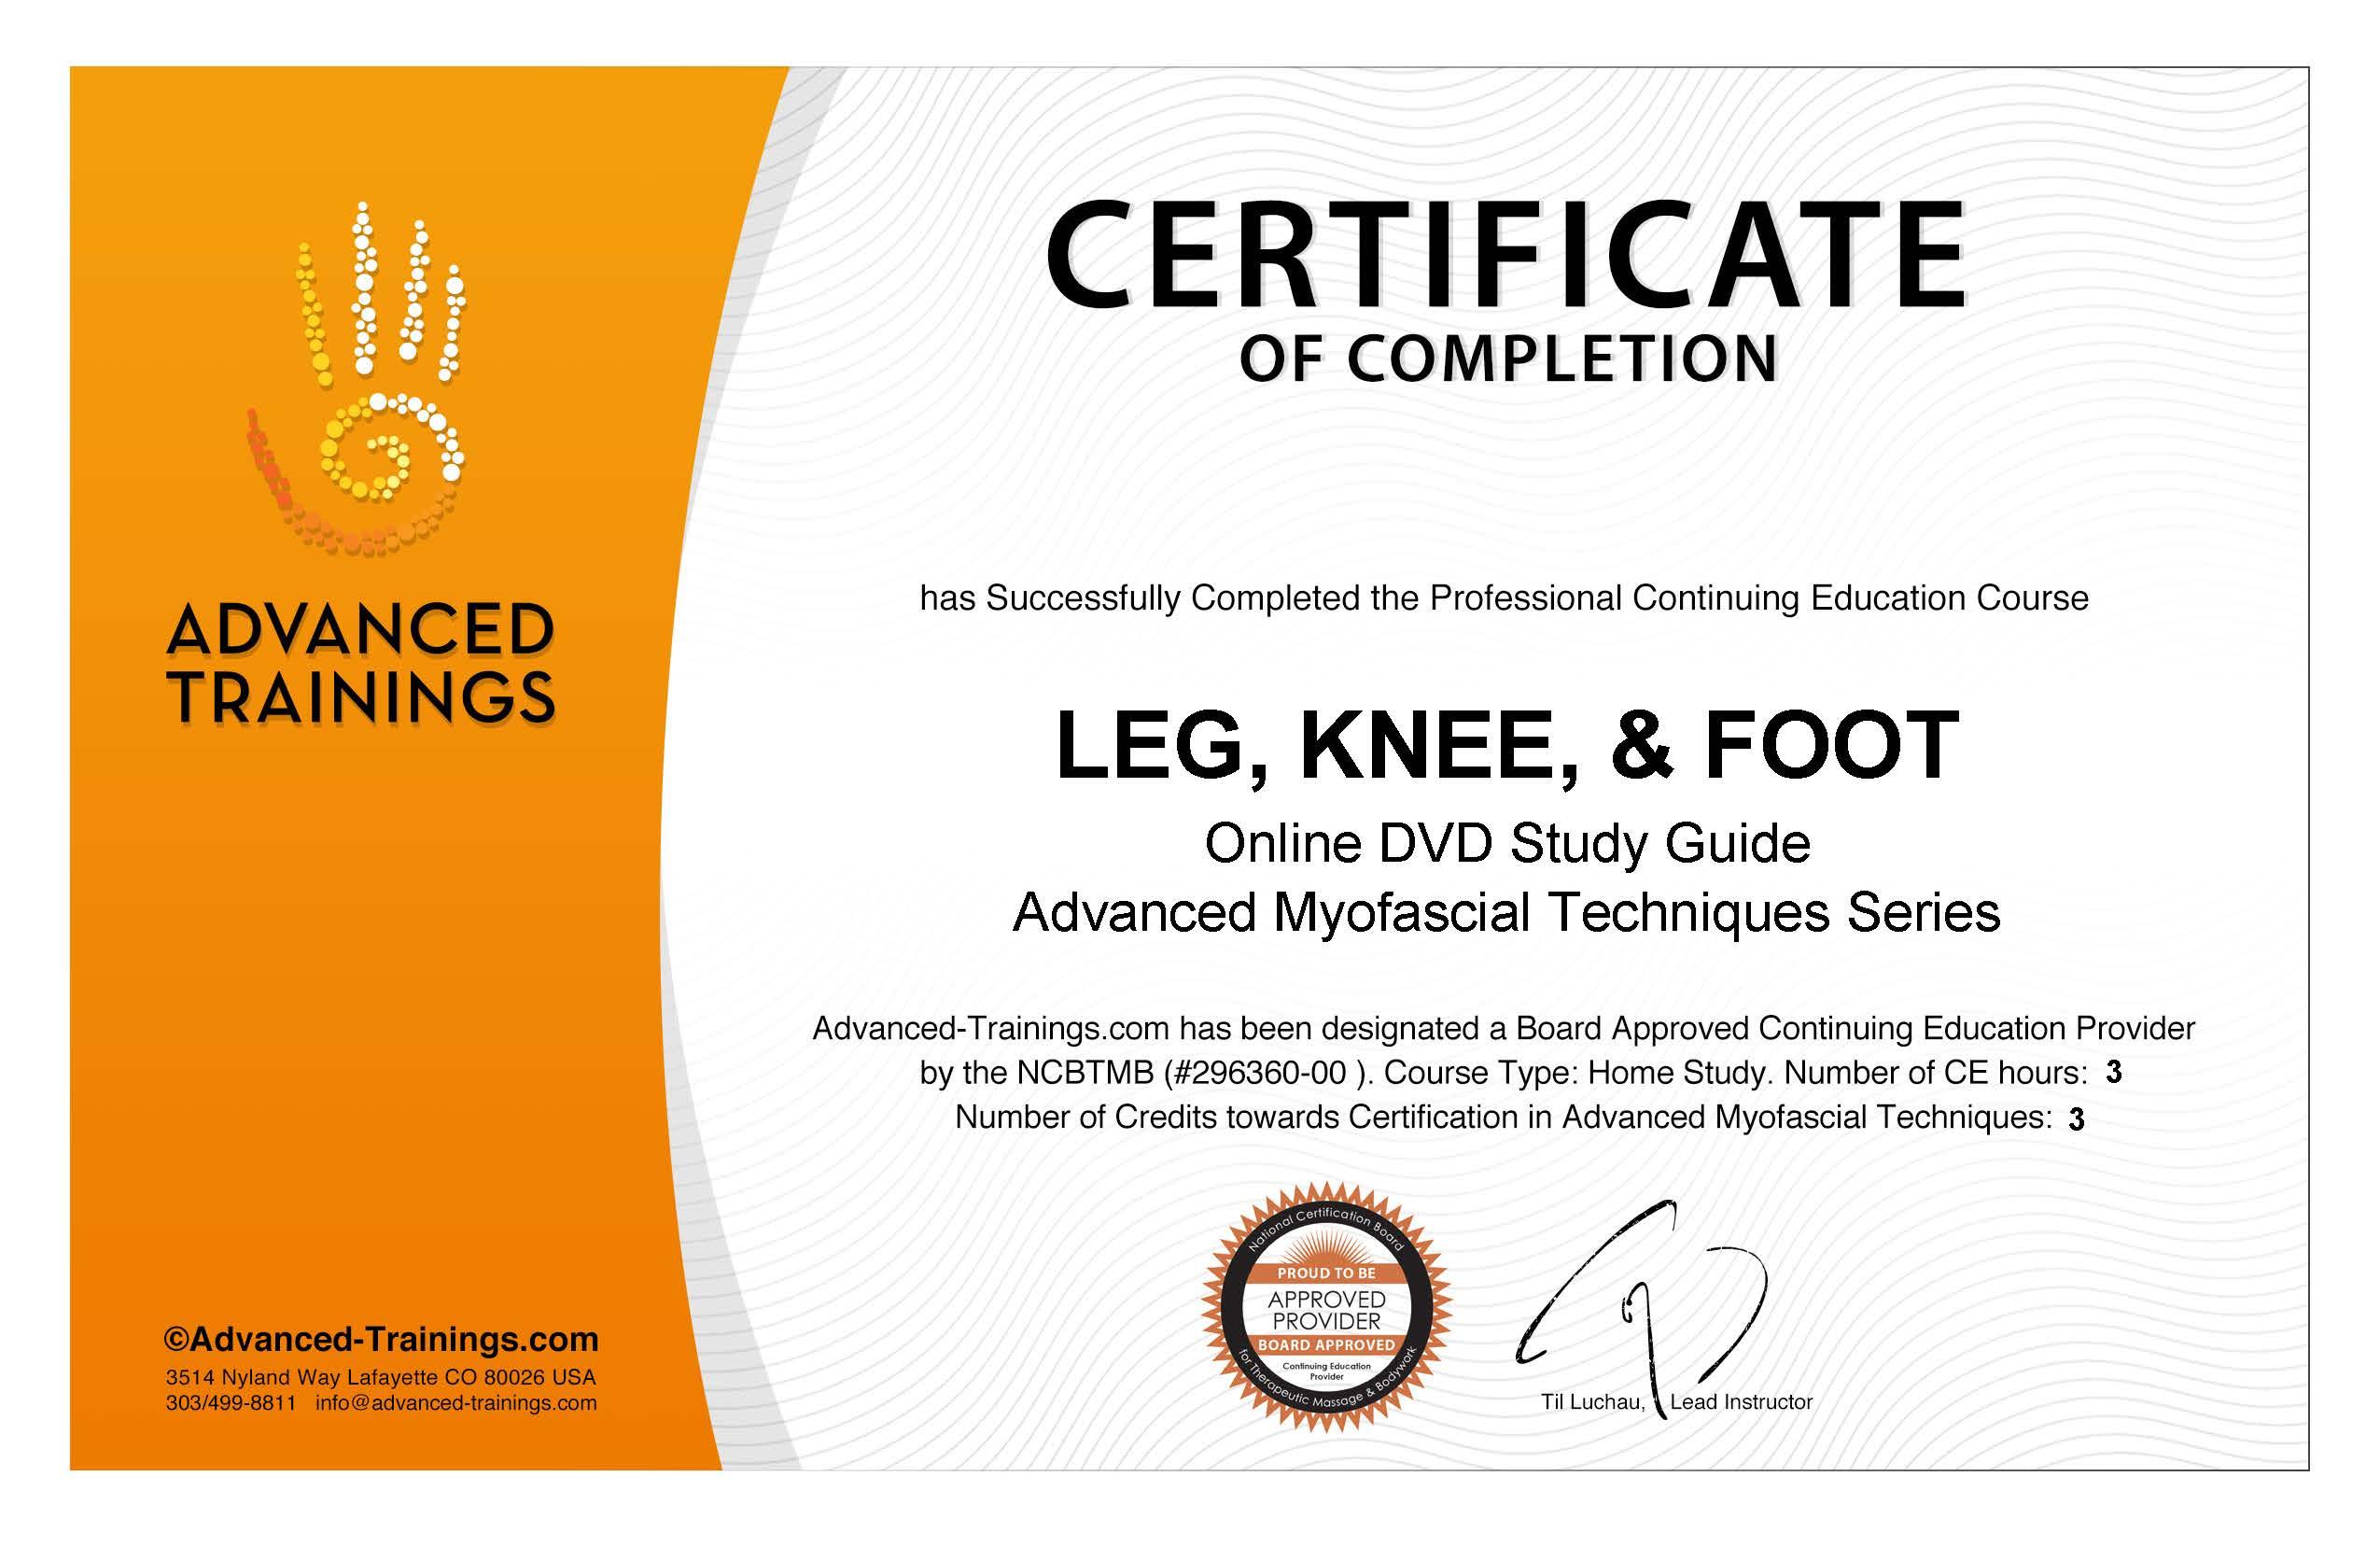 Leg Knee Foot Adv Myofascial Techniques Certificate Credits